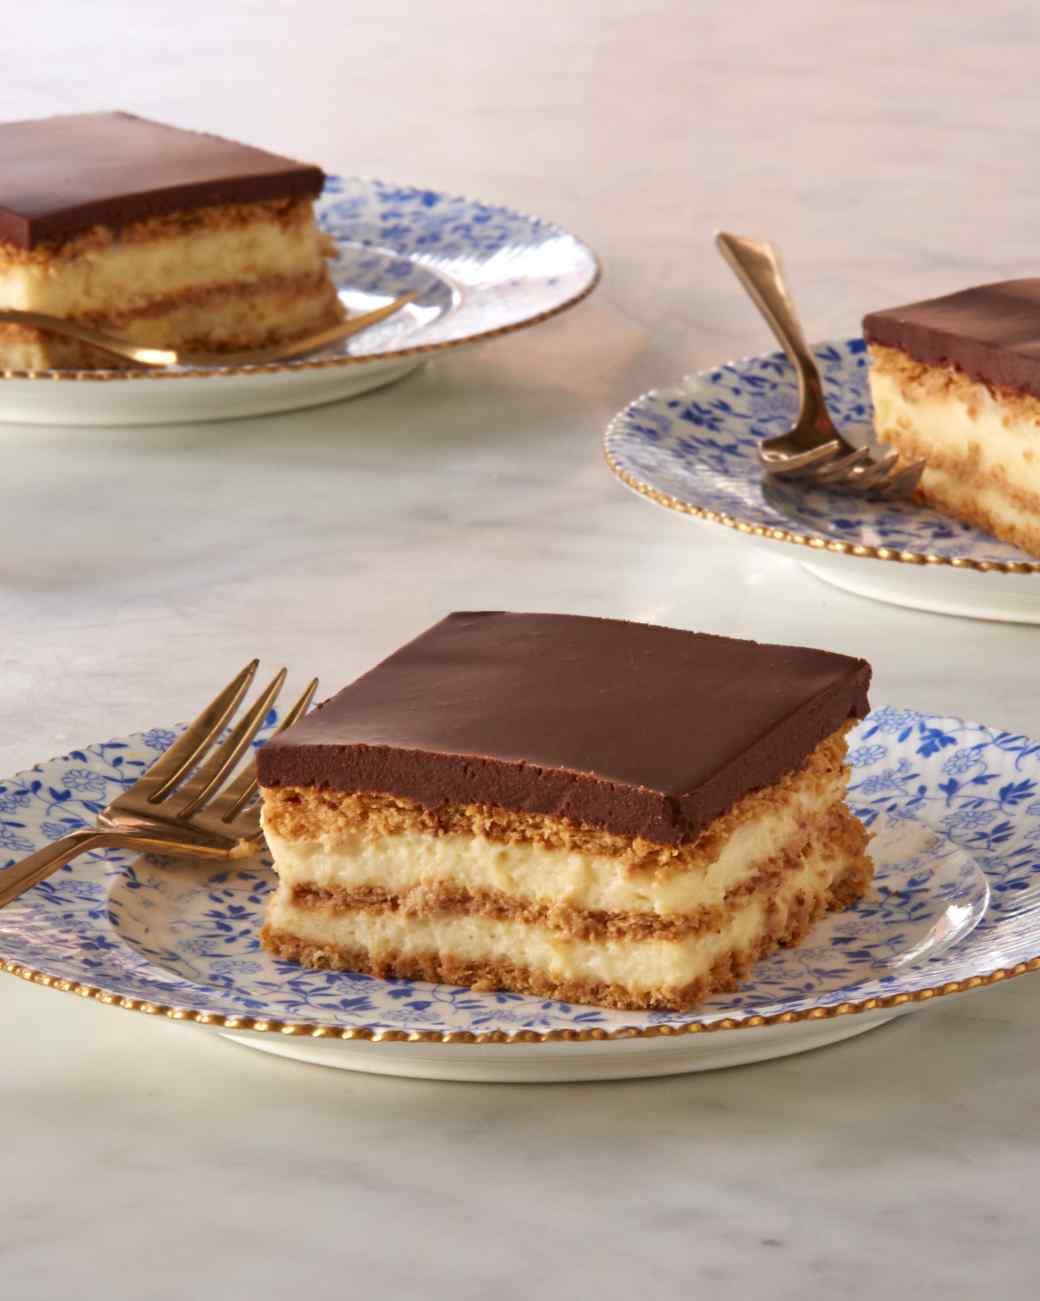 tort-shokoladnyj-iz-krekierow-ot-marty-stuart